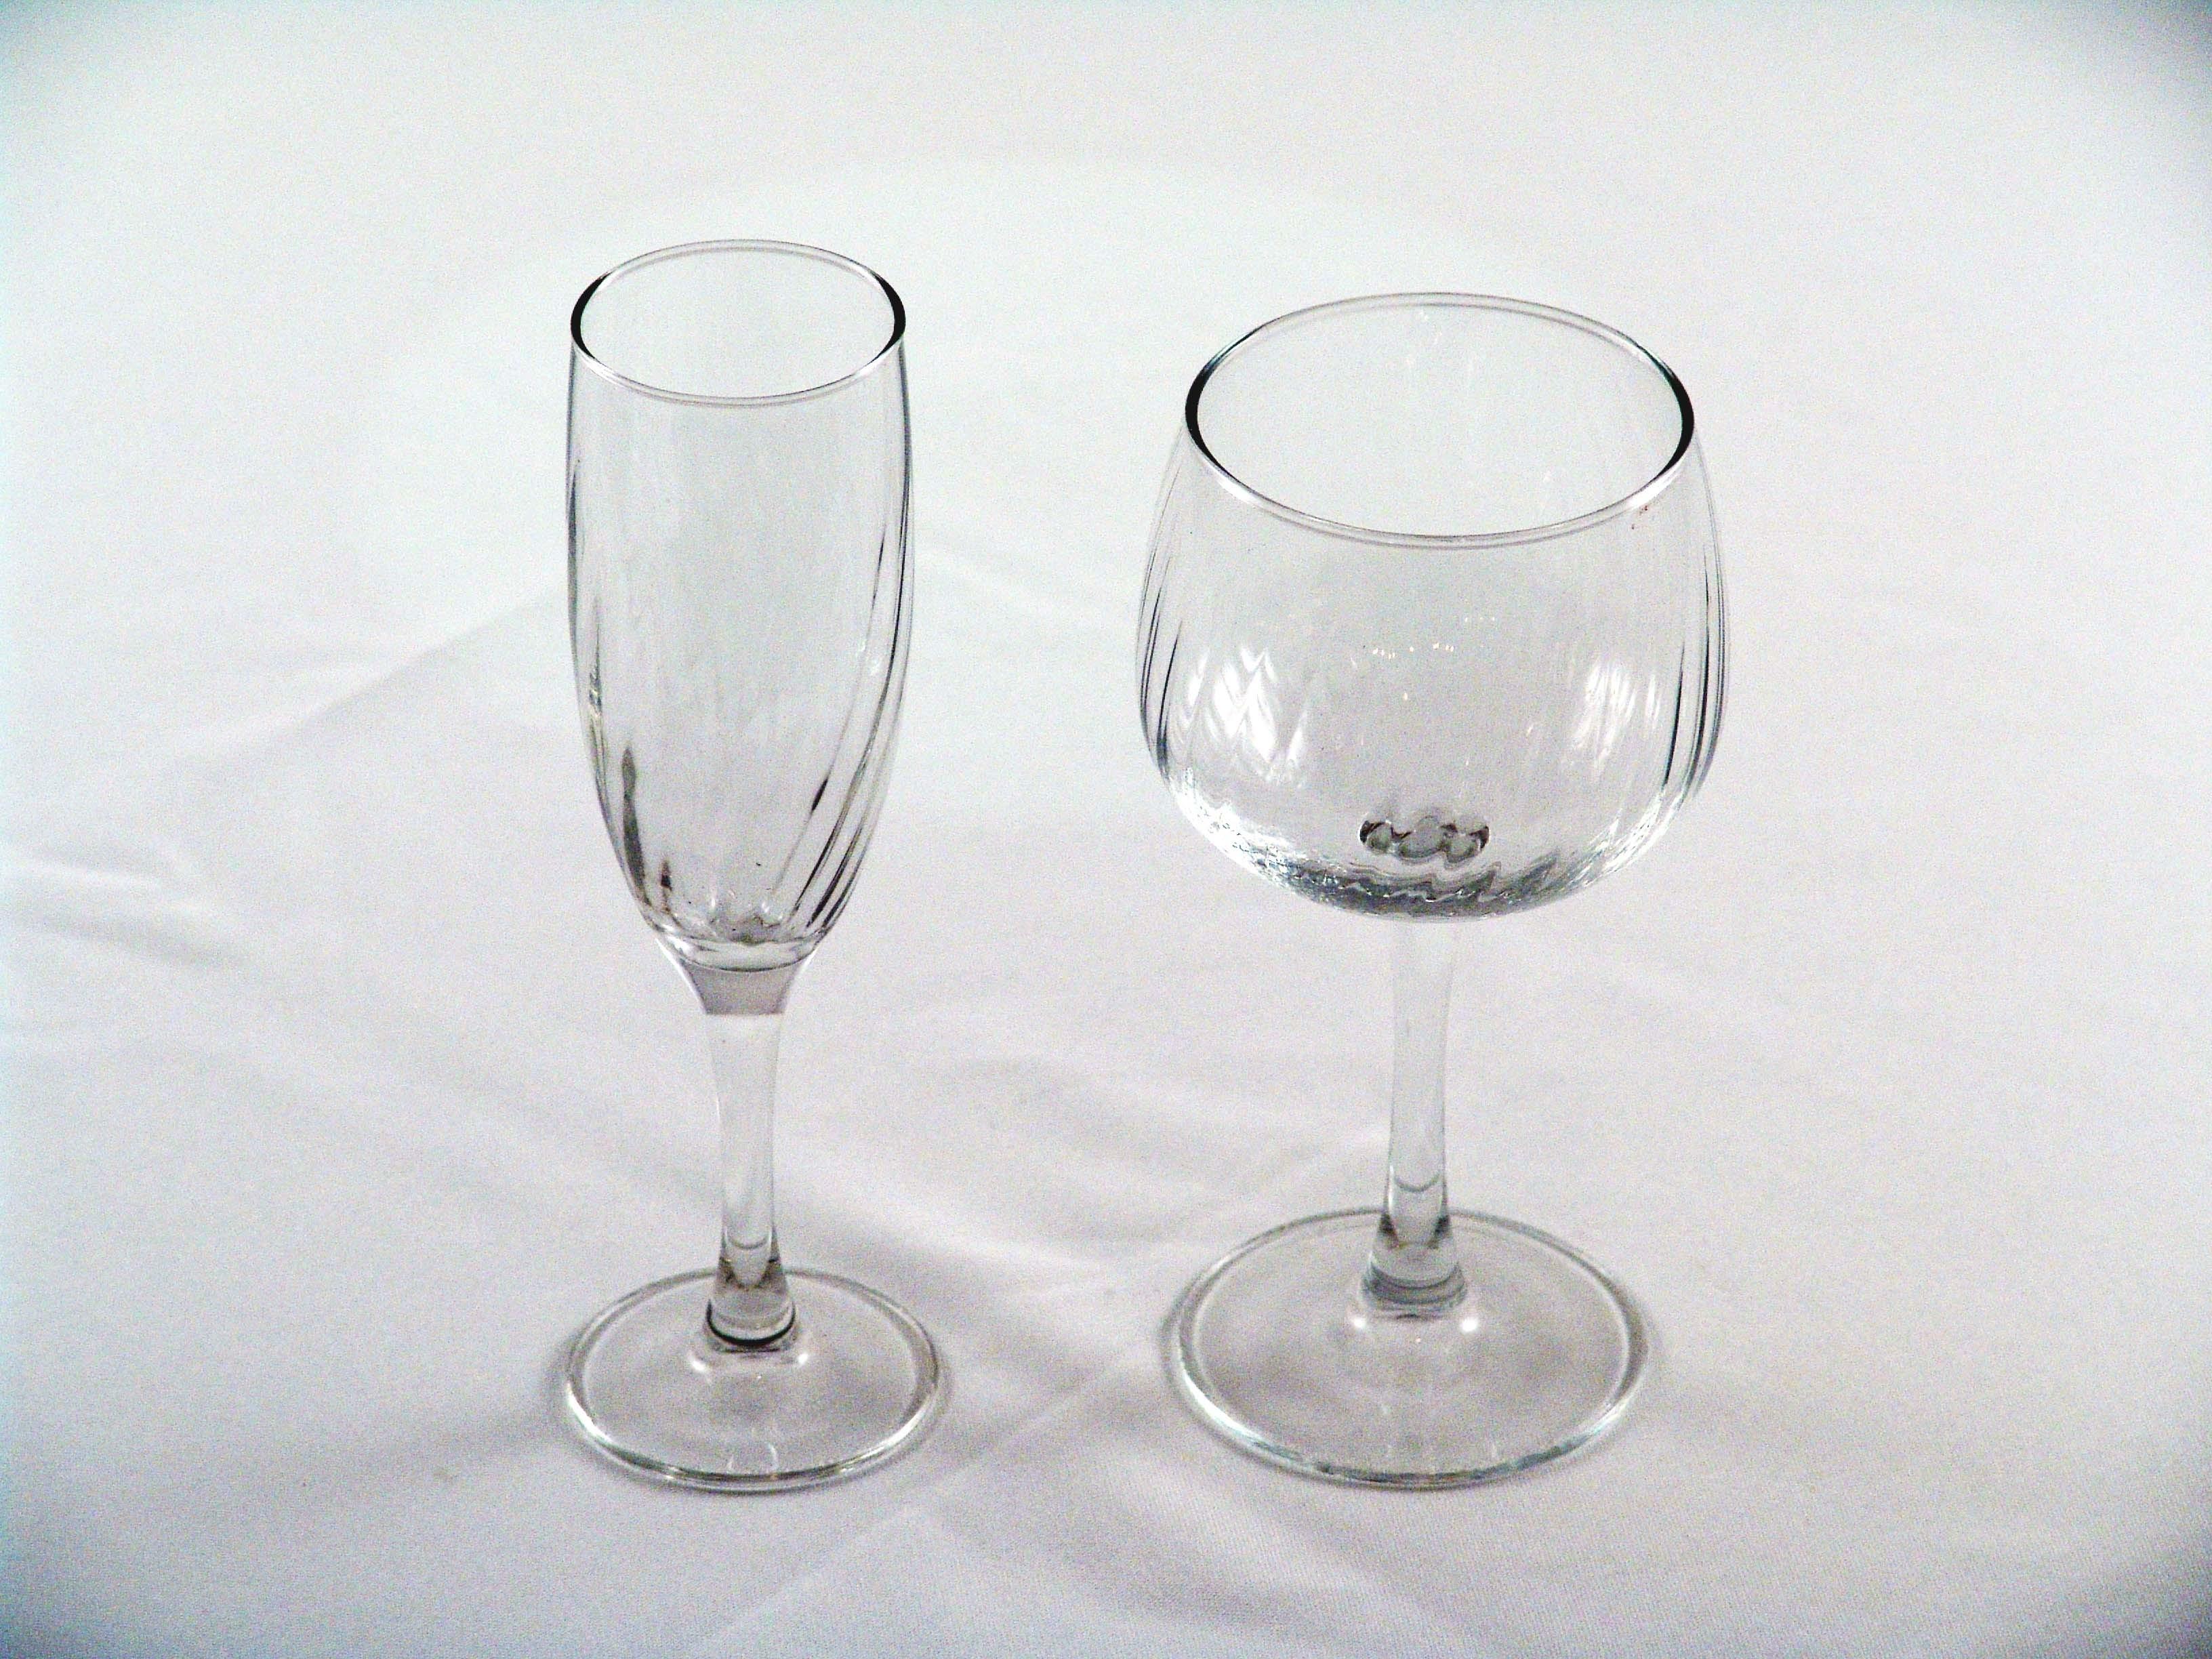 Optic Spiral Glasses